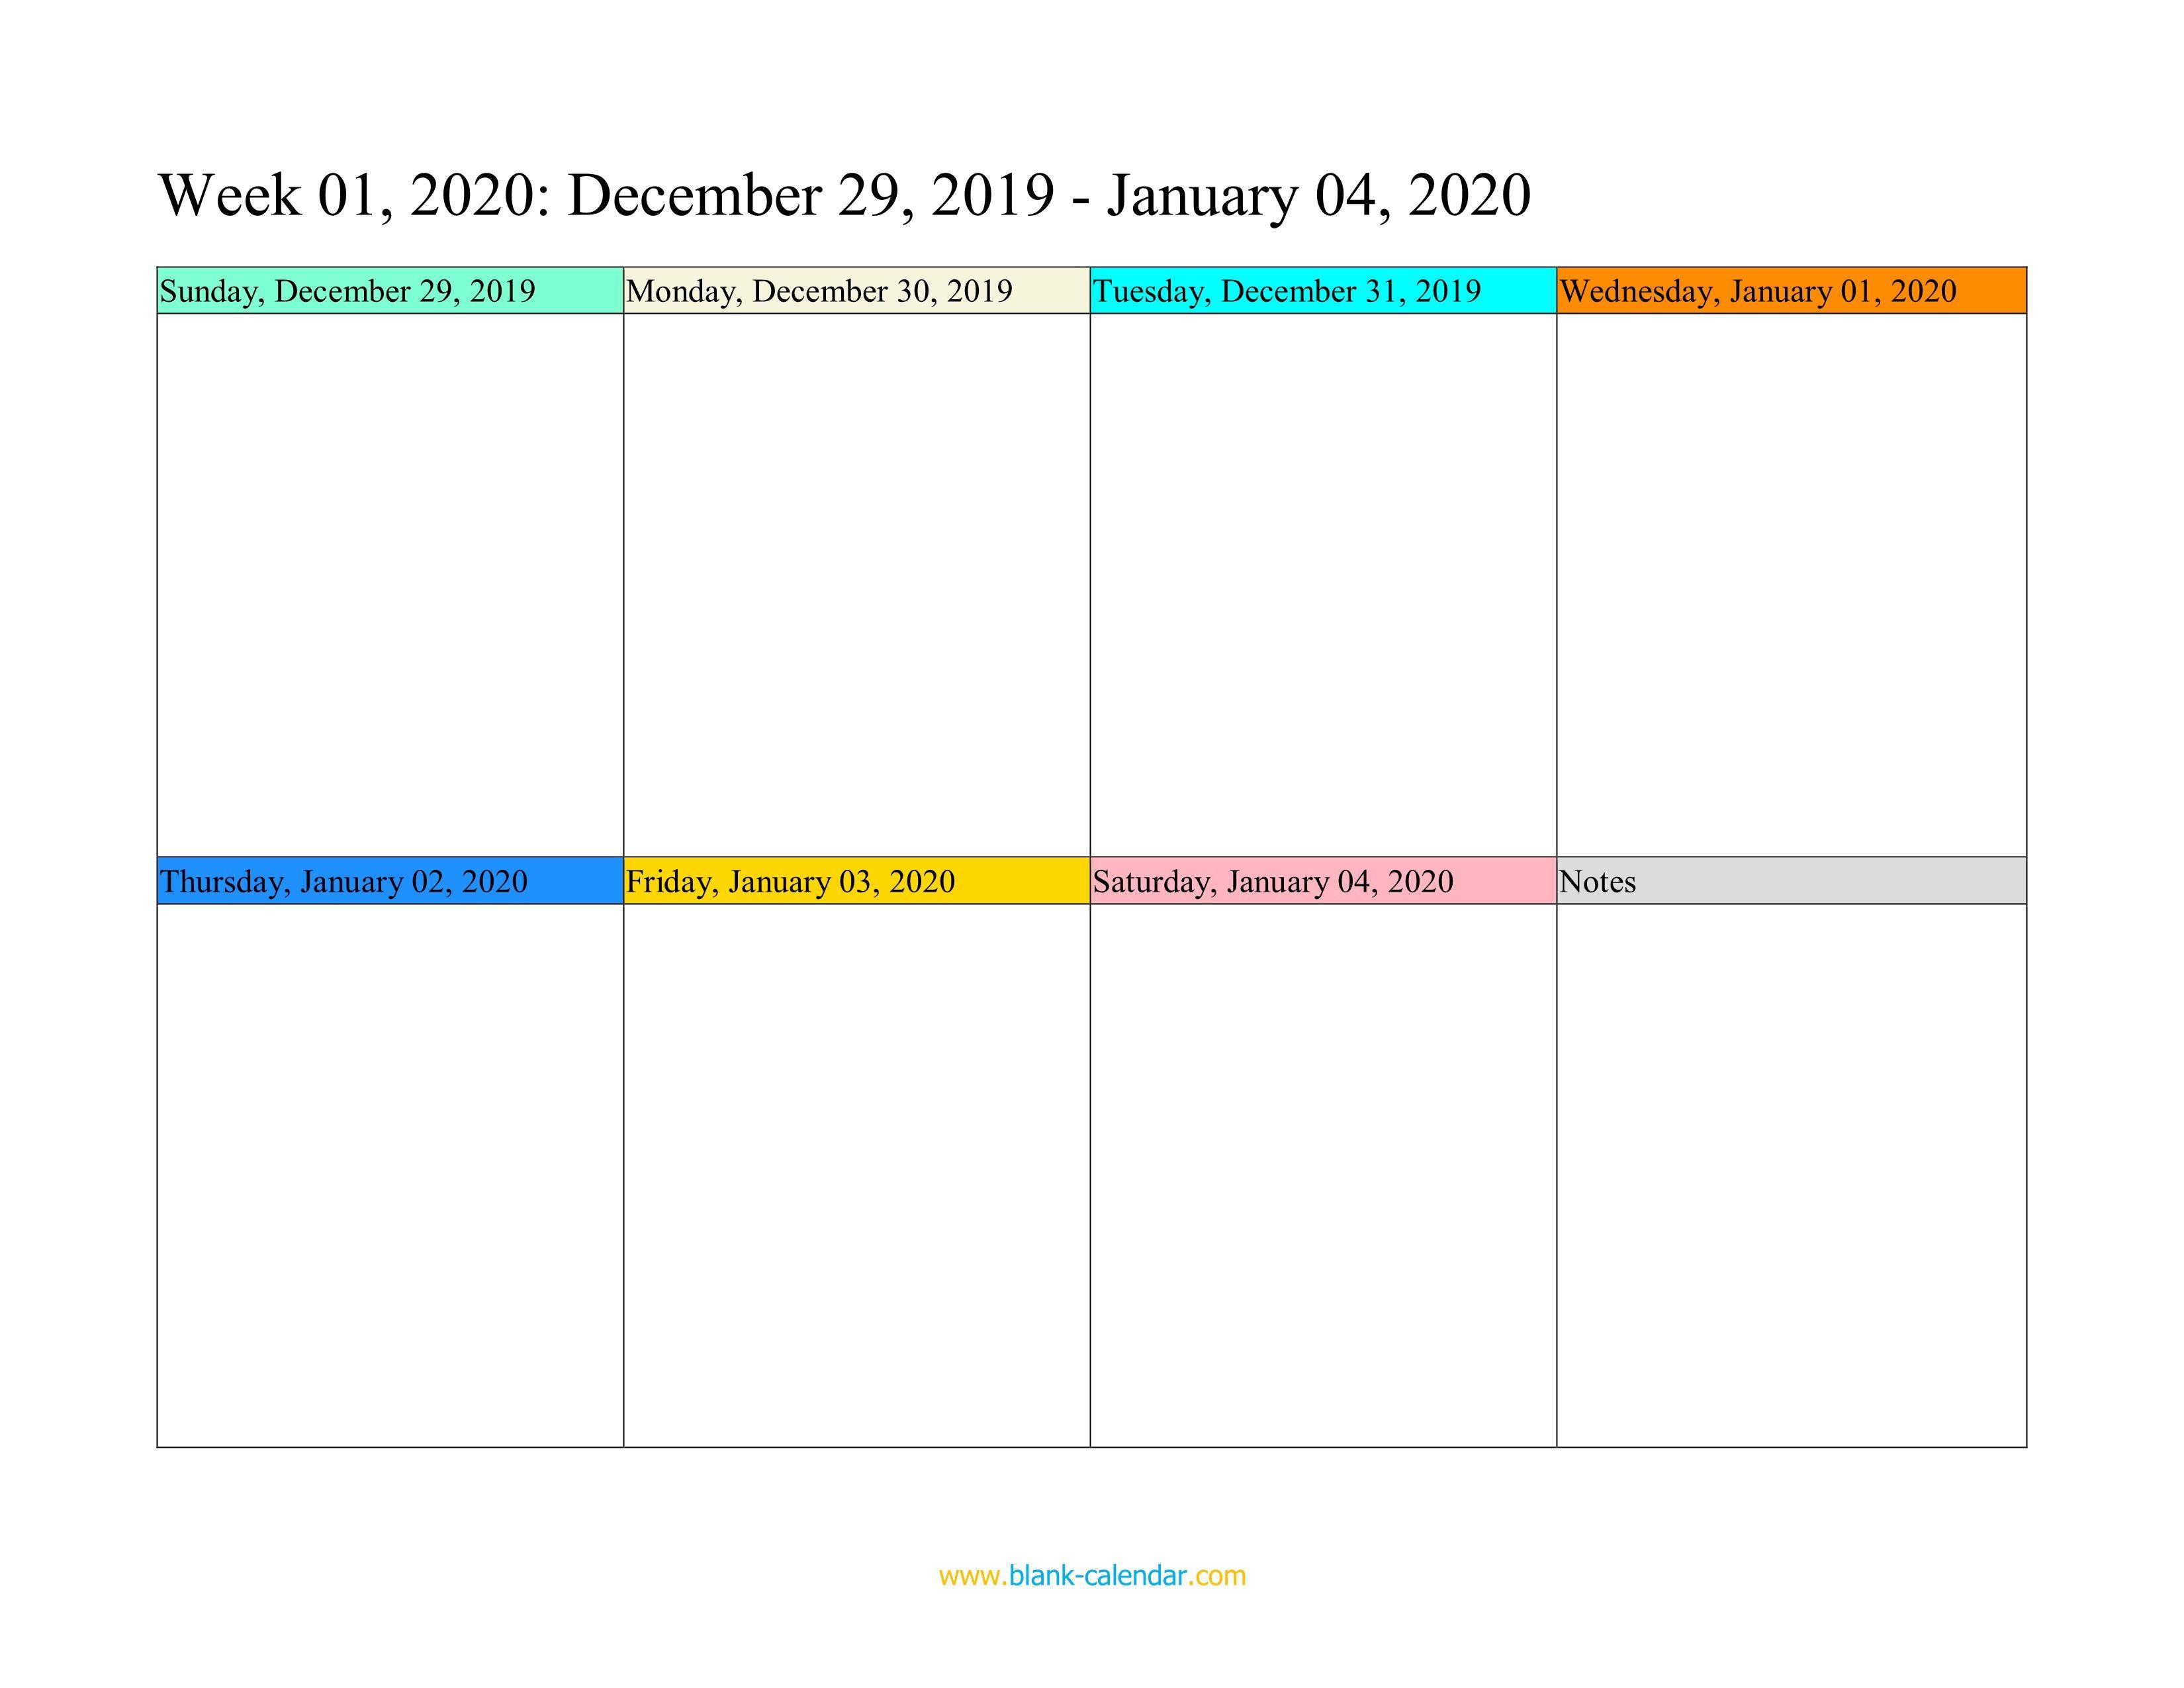 005 Fascinating Weekly Calendar Template 2020 Image  Printable Blank FreeFull